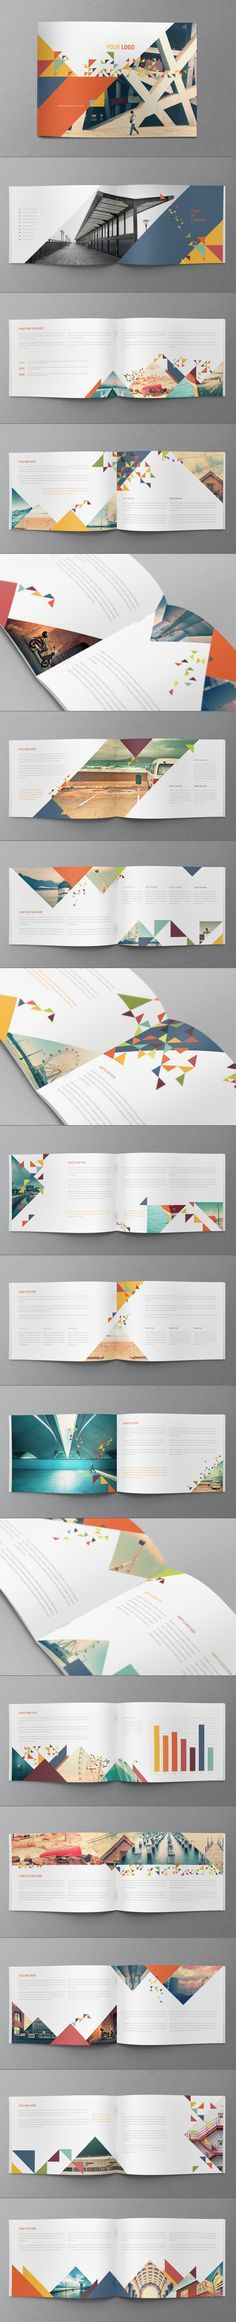 Colorful Modern Brochure by Abra Design, via Behance